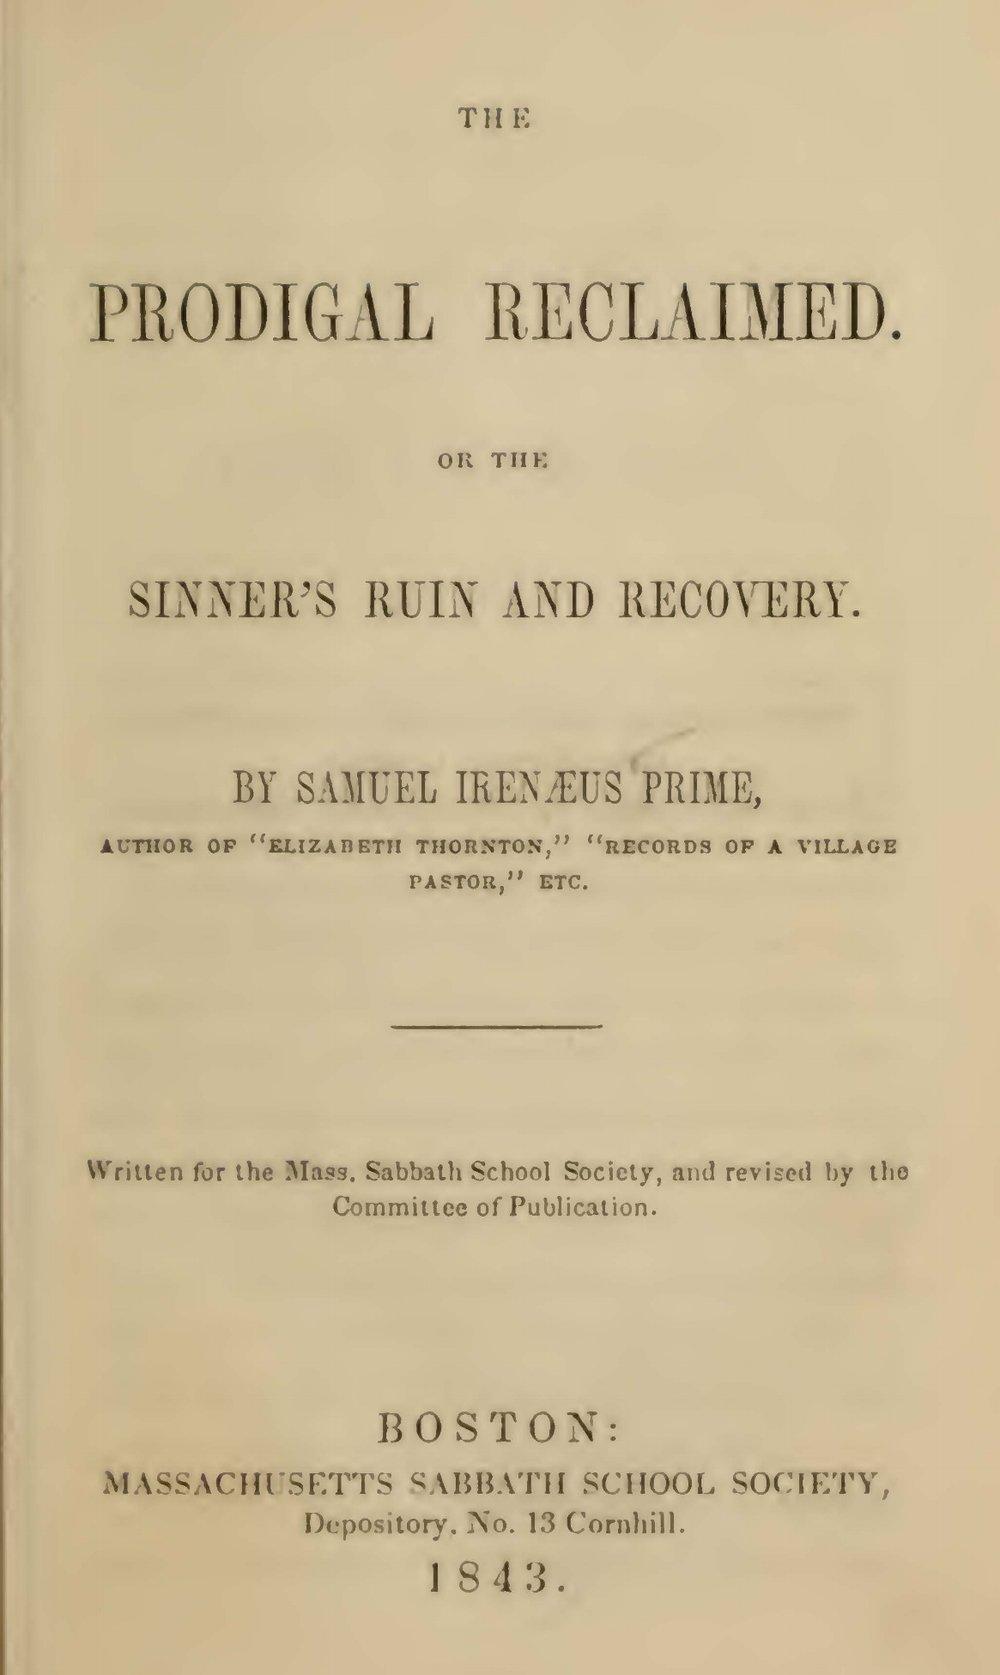 Prime, Samuel Irenaeus, The Prodigal Reclaimed Title Page.jpg